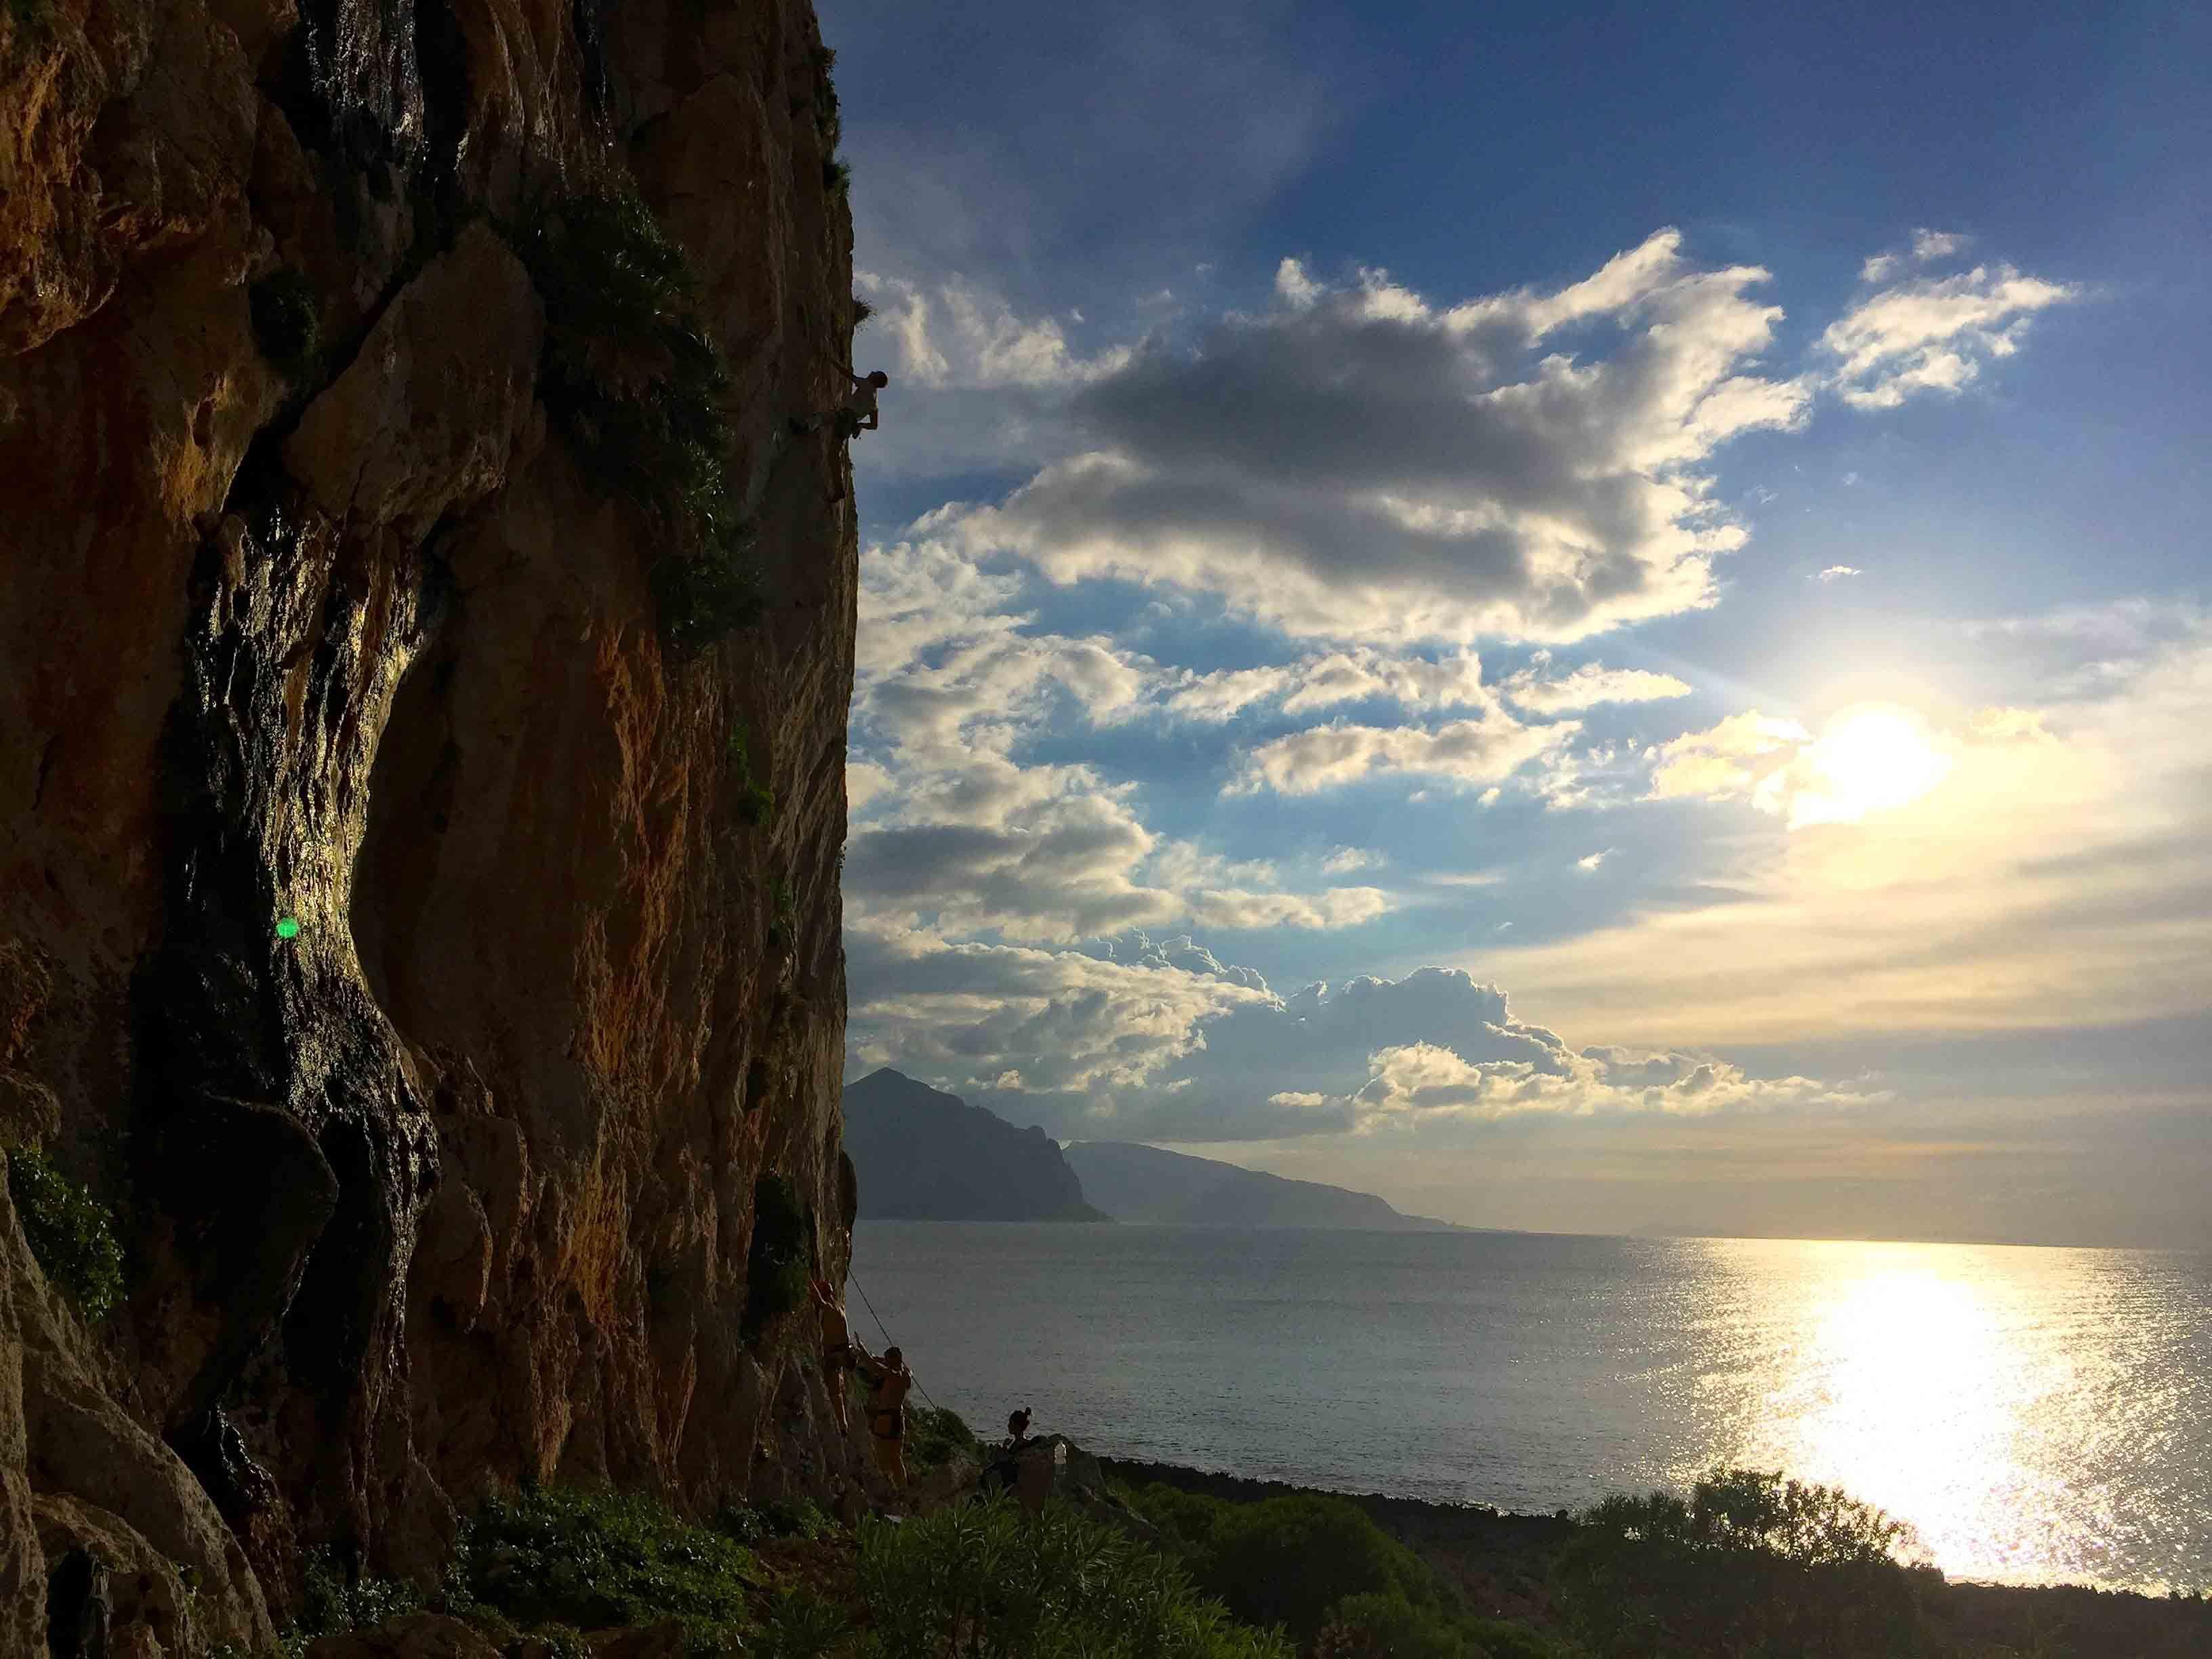 Klettern in Sizilien, klettern san vito